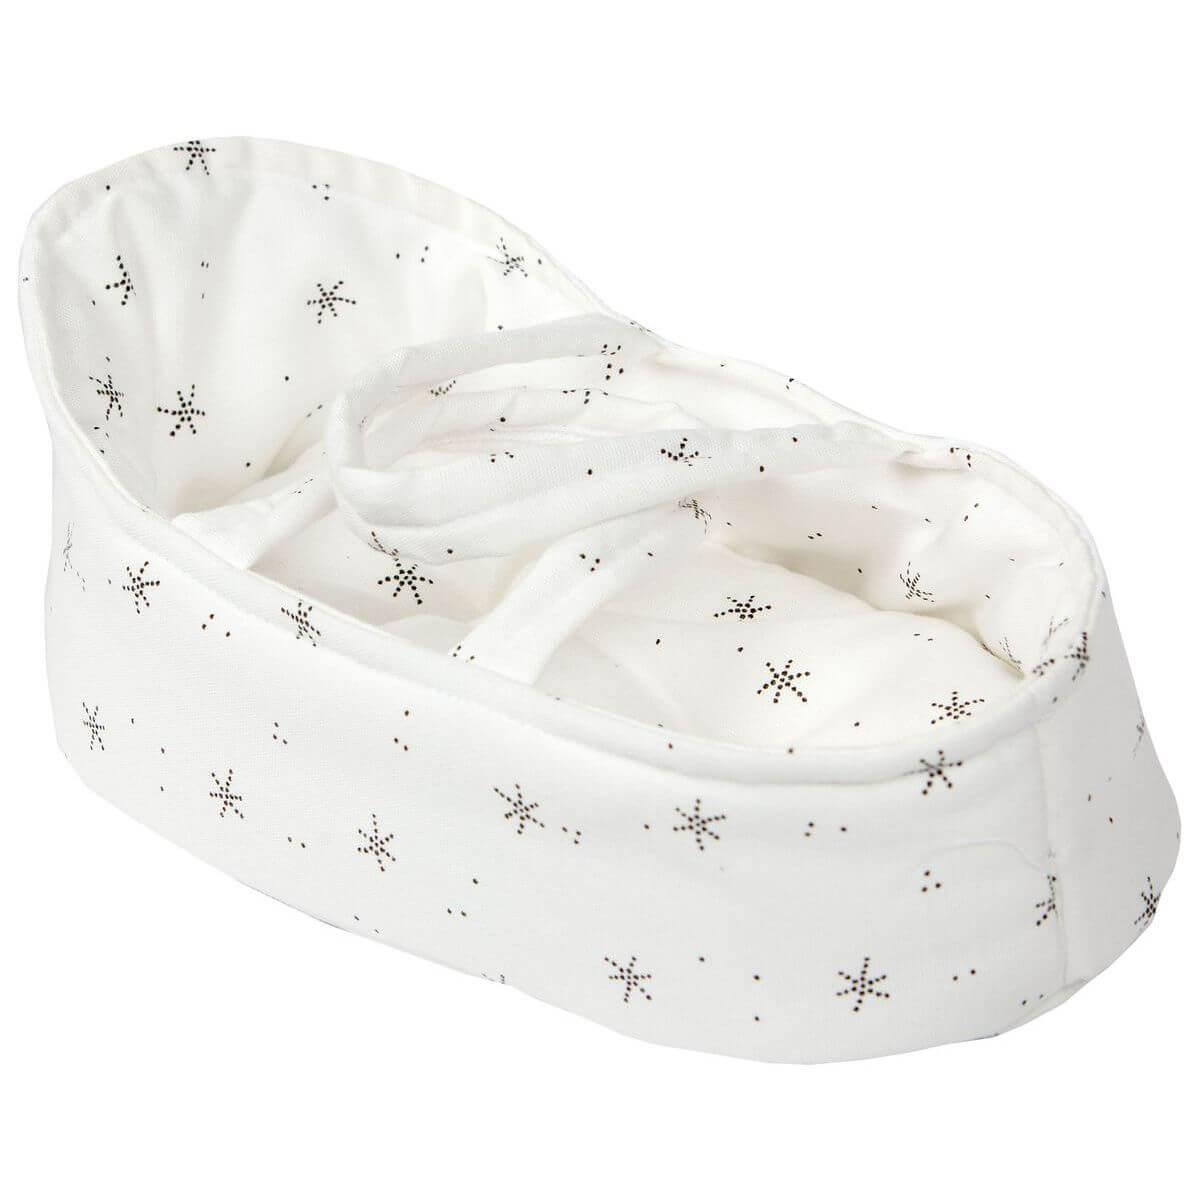 Couffin poupée 26cm STAR Barrutoys blanc